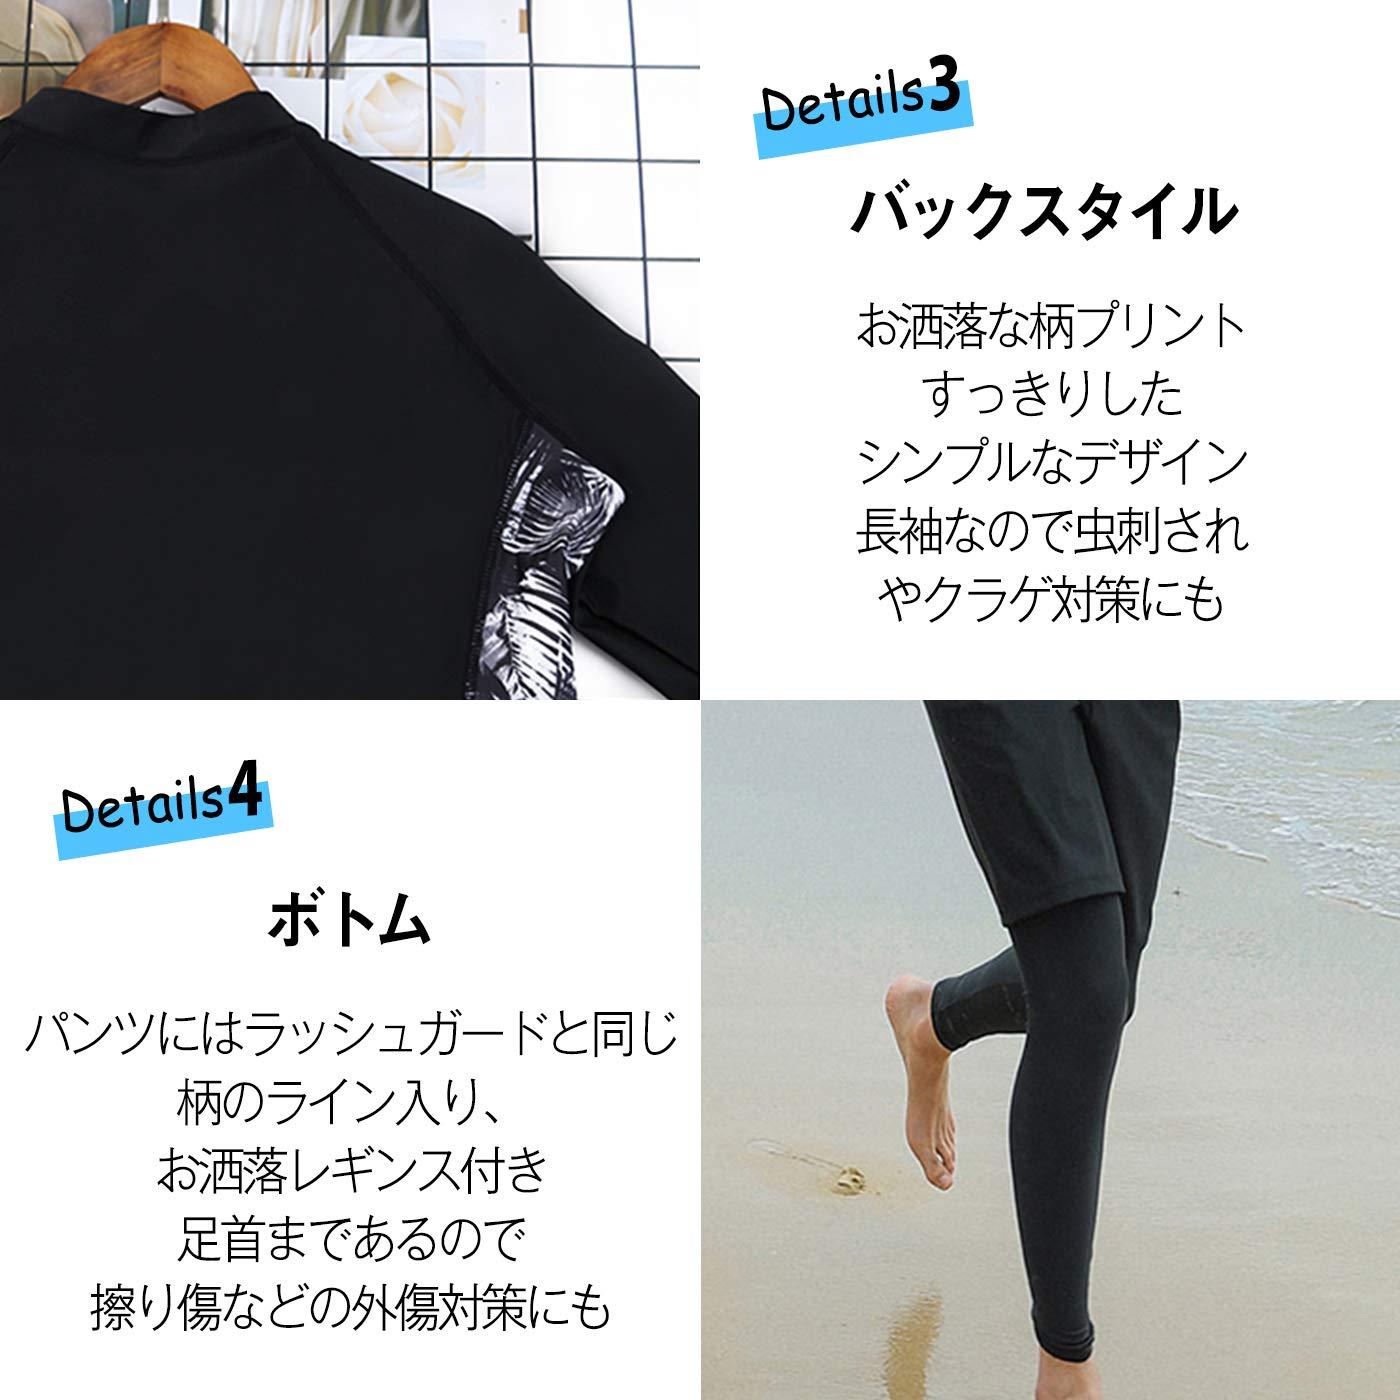 9db6cff90b9 Amazon | ラッシュガード メンズ 長袖 水着 サーフパンツ オシャレ レギンス フィットネス 豪華二点・三点セット[UVカット  UPF50+・吸汗速乾] | 水着 通販